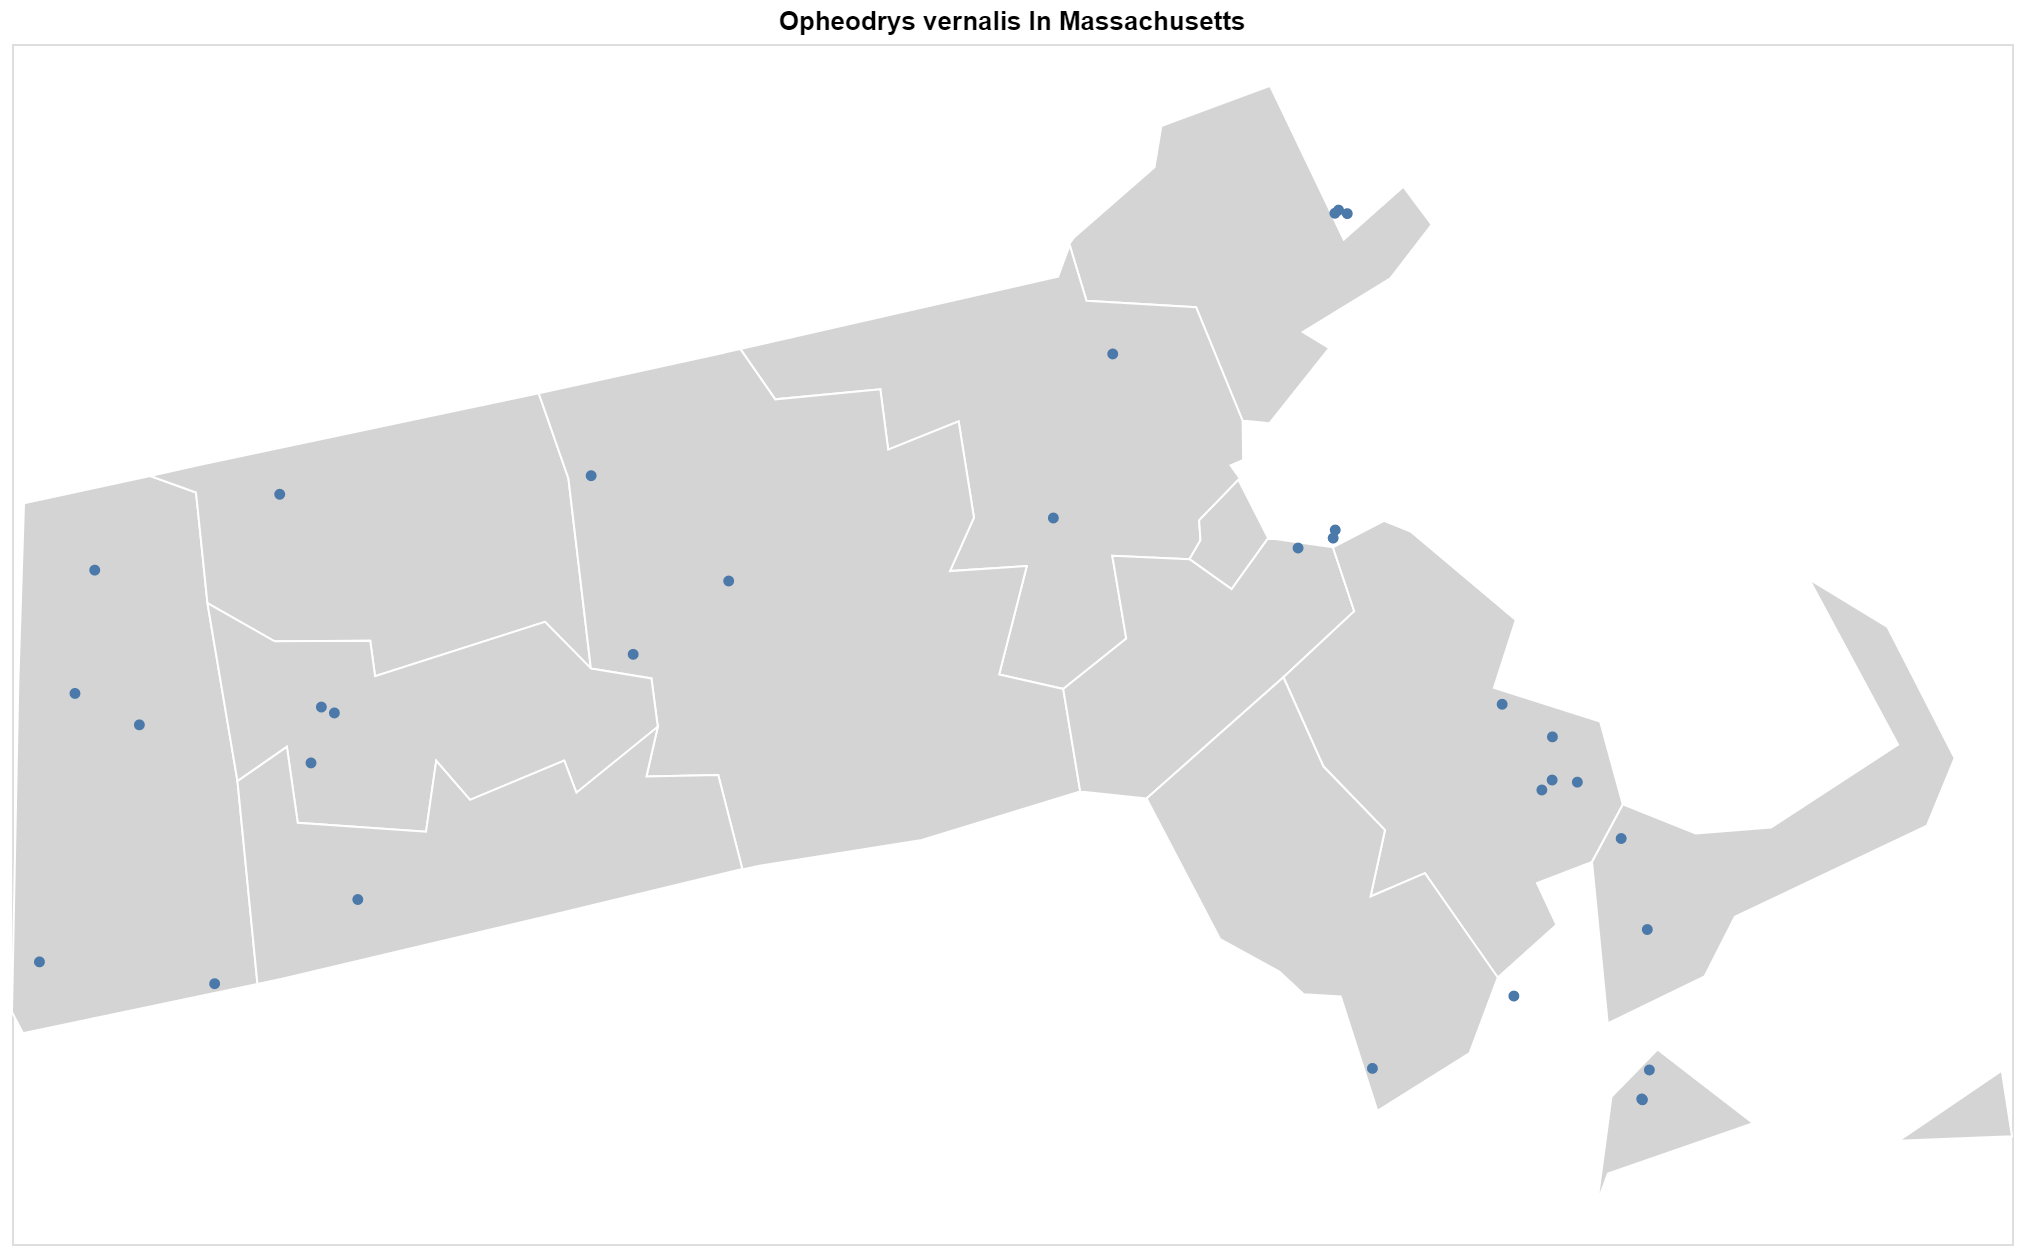 Opheodrys vernalis Massachusetts map